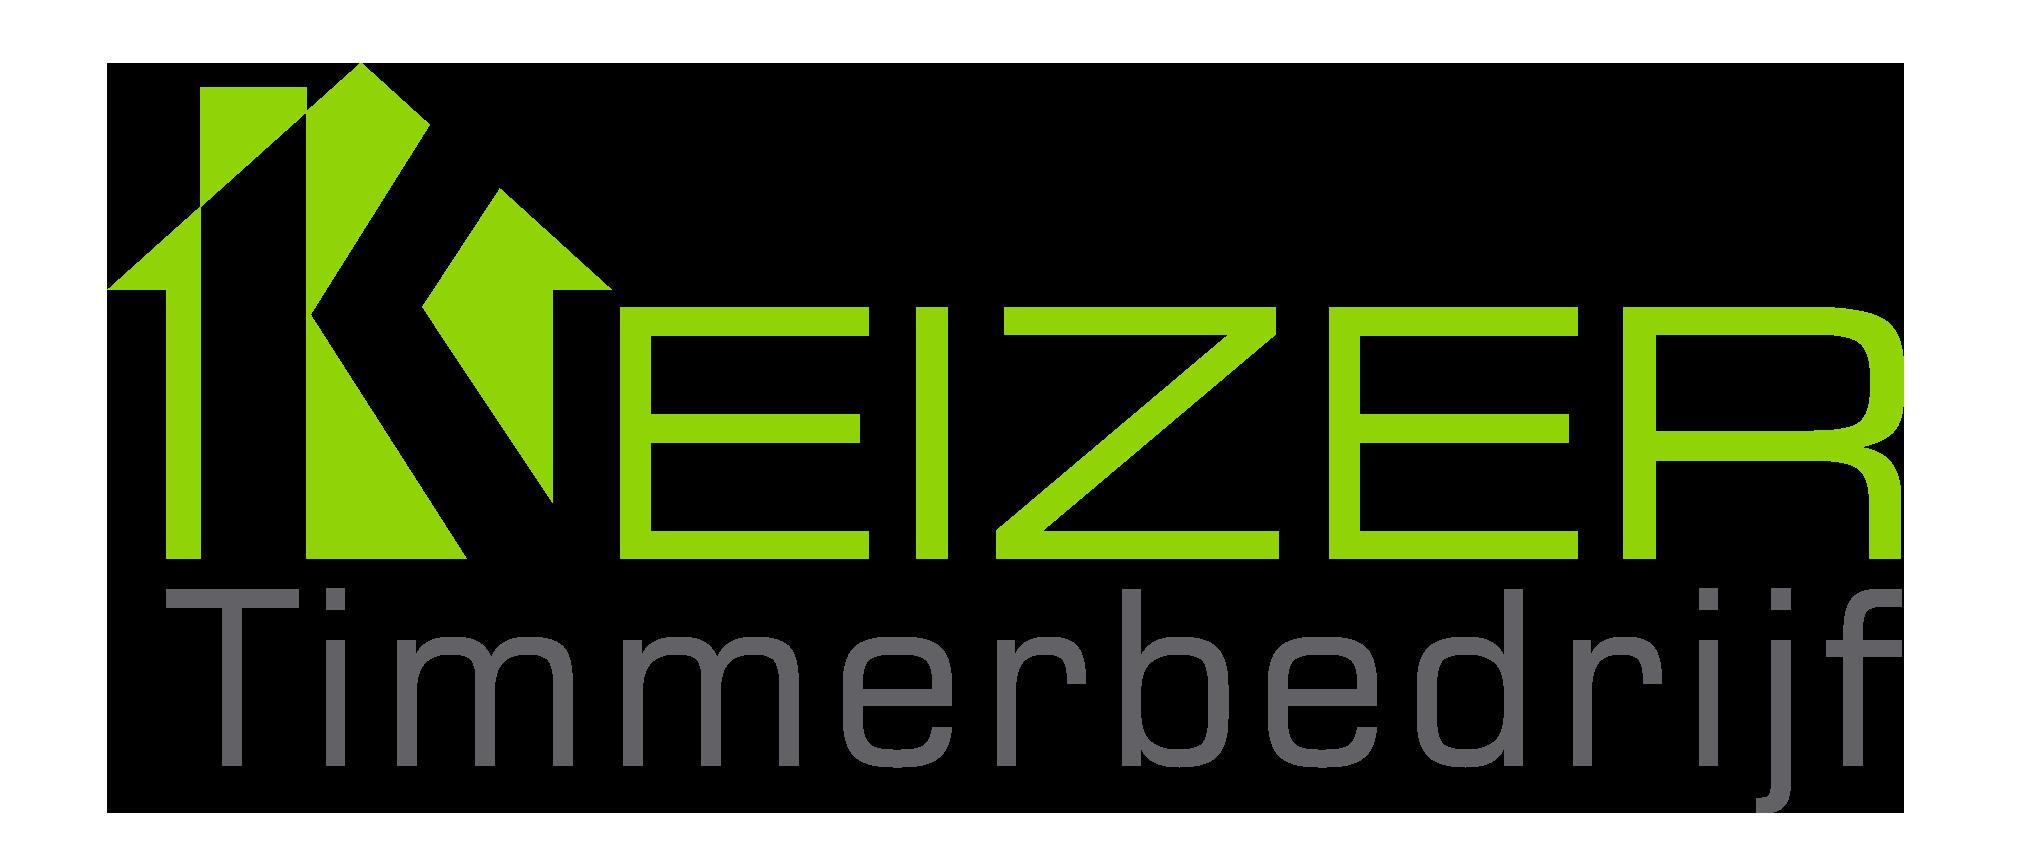 Keizer Timmerbedrijf Logo Work by René